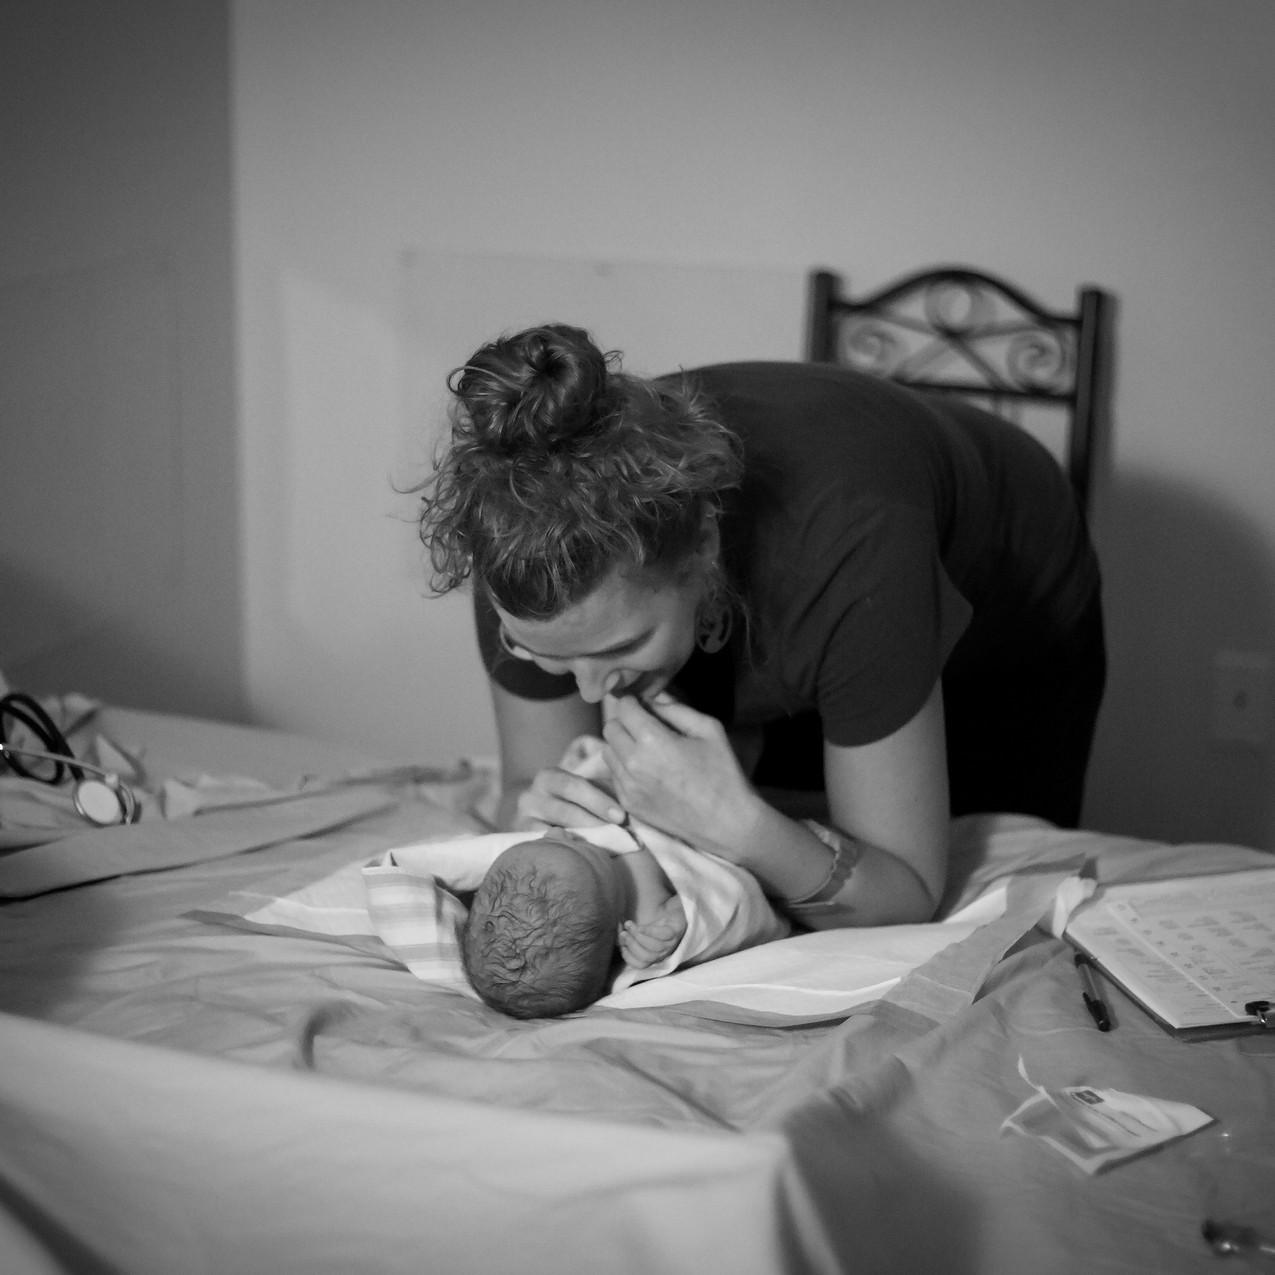 TampaBirthPhotographerLaborOfLoveBirthCenterLaborofLovebirthcenterTampaTampa Birth Photographer Tampa newborn Photographer in water birth Labor of love Lutz Fl_Jan252017_0284 copy